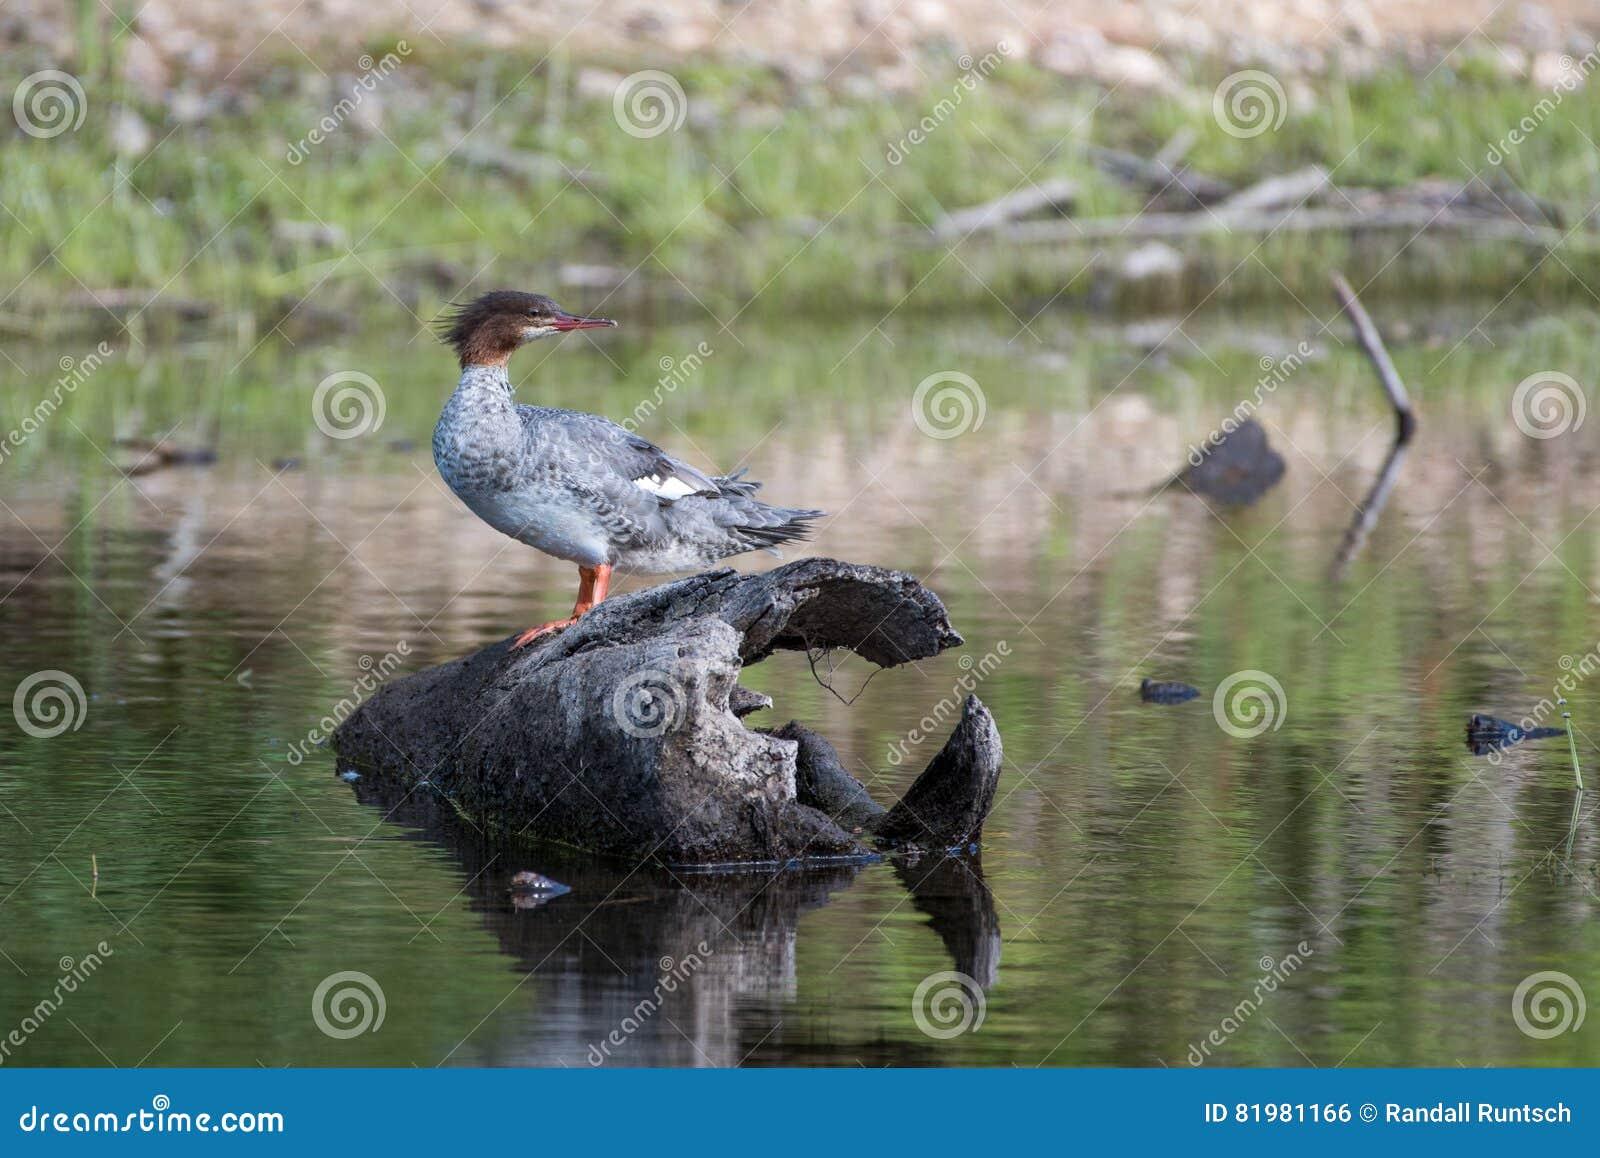 Pollo de agua común Hen Swimming en una charca